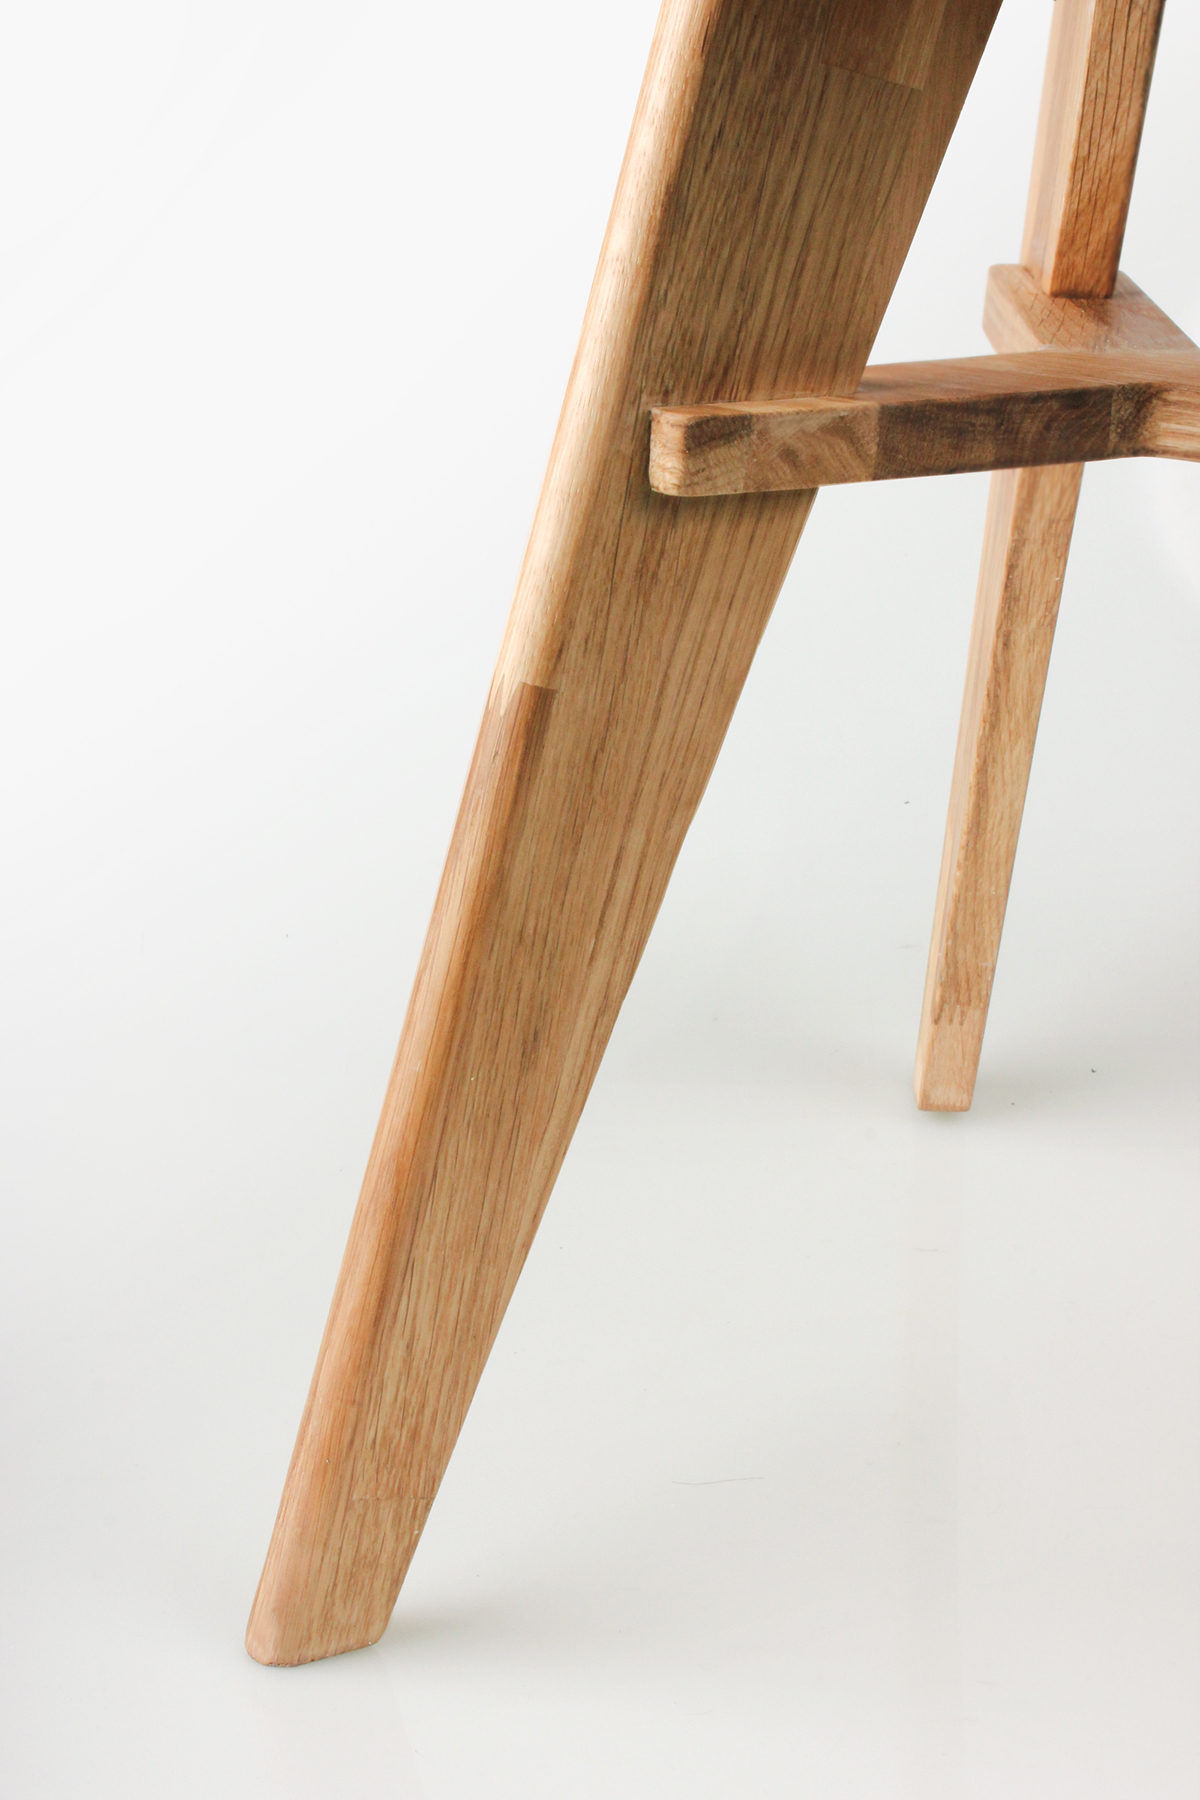 chair stool Up-Cycling design studio hybrid wood white oak Zero per stoo leftover 0%. zero furniture HATTERN upcycle